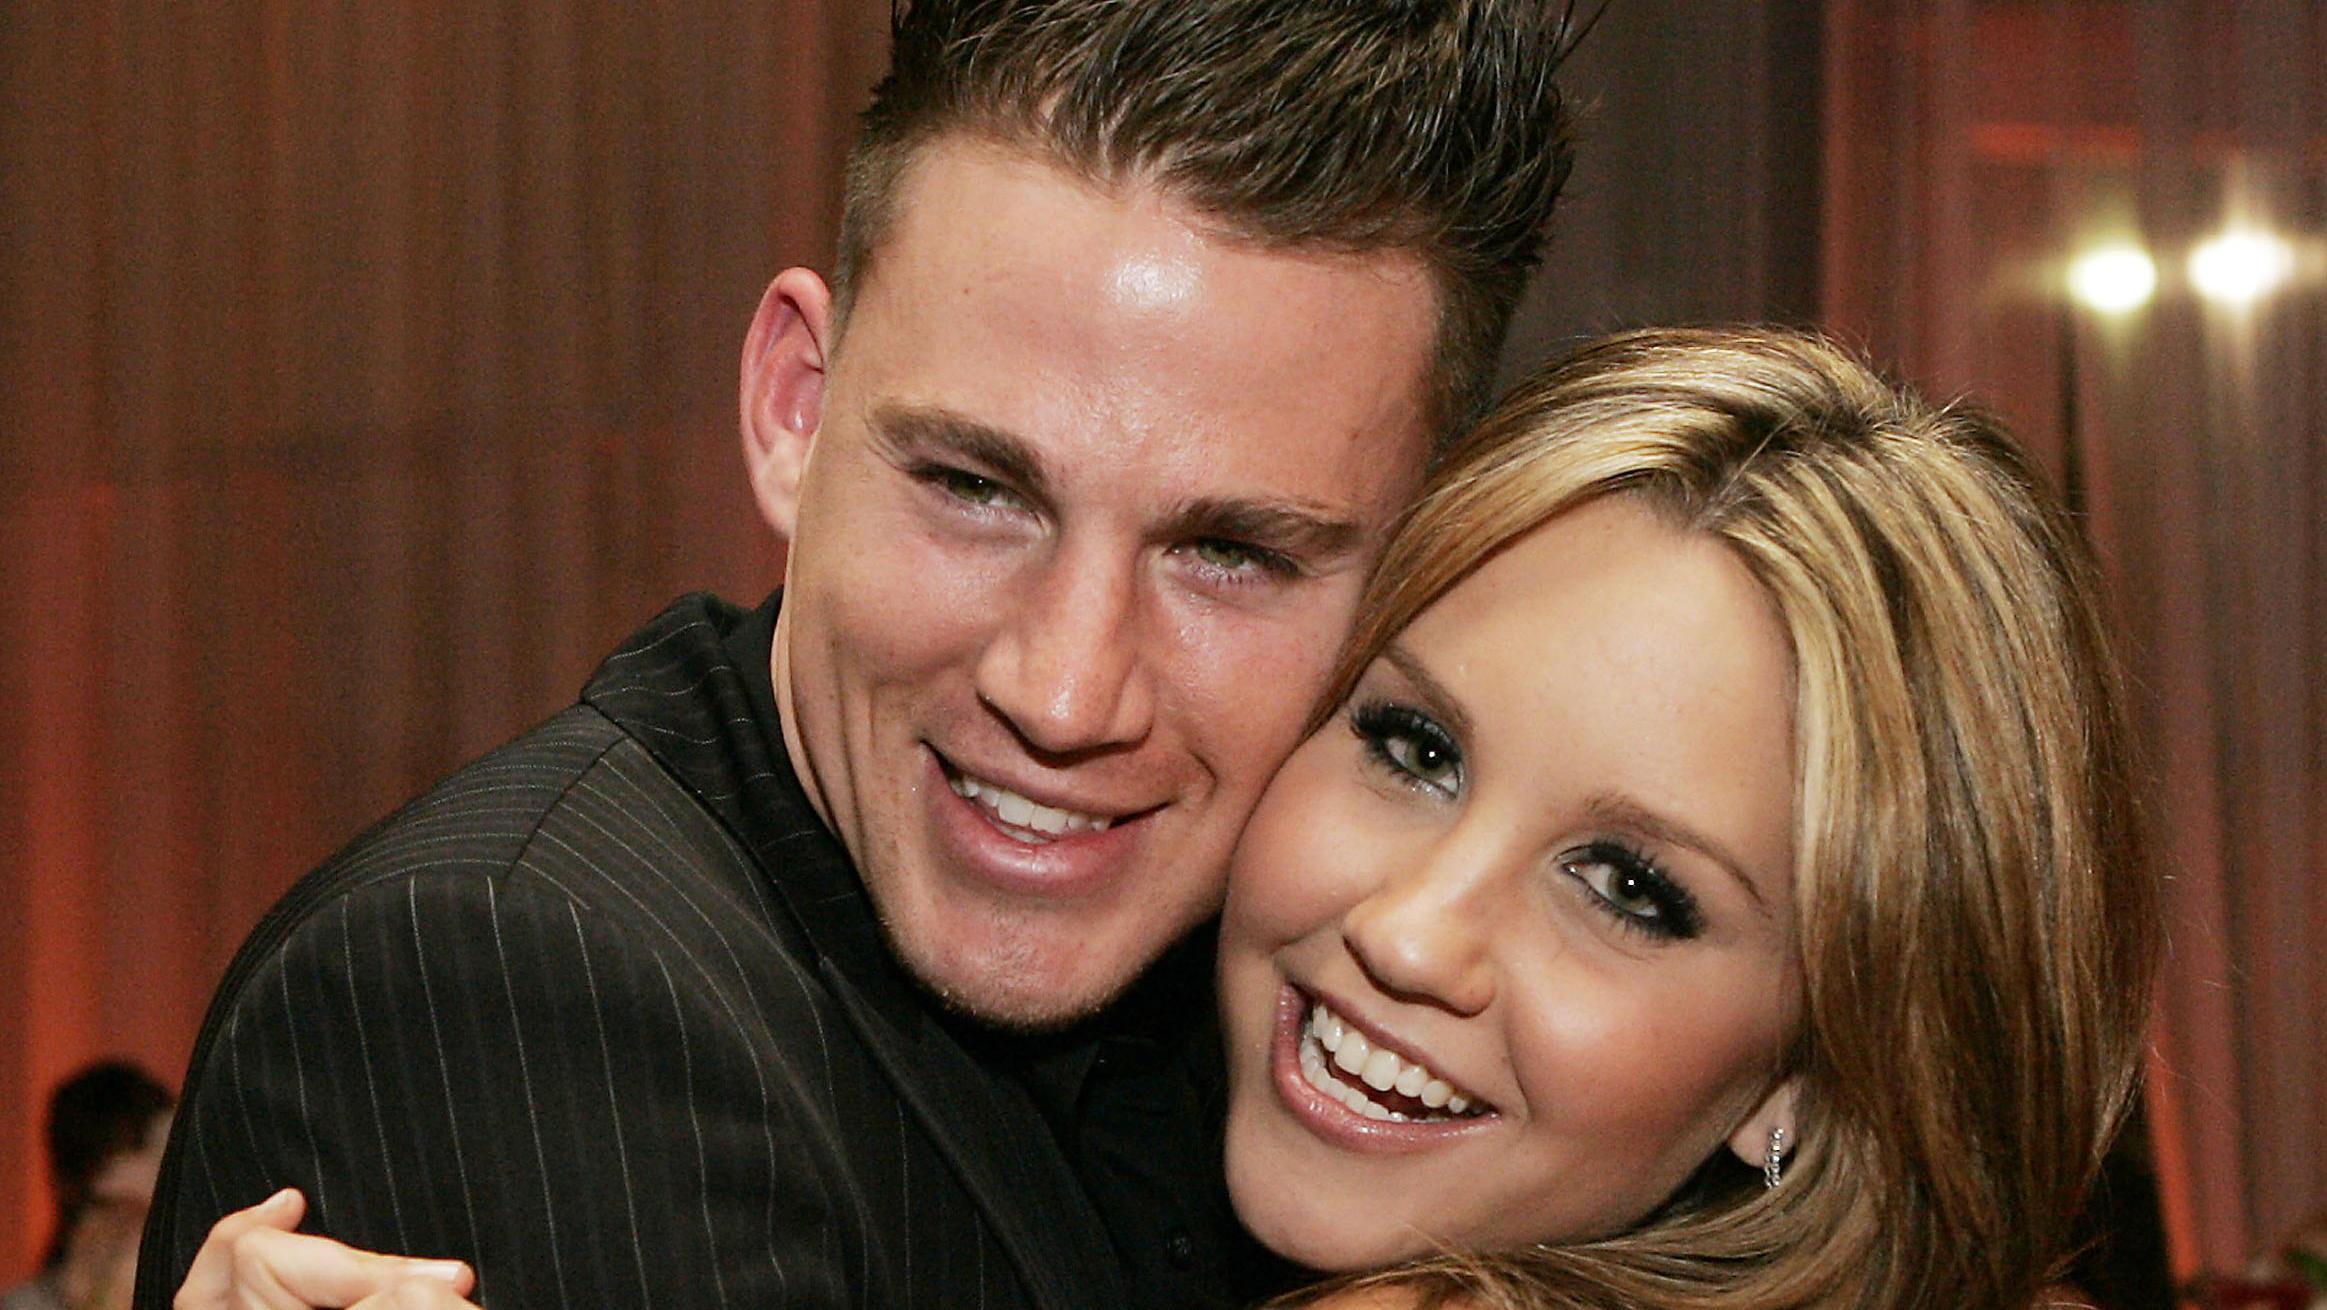 Channing Tatum Says He Loves Amanda Bynes For Helping Him Start His Career Cbs News